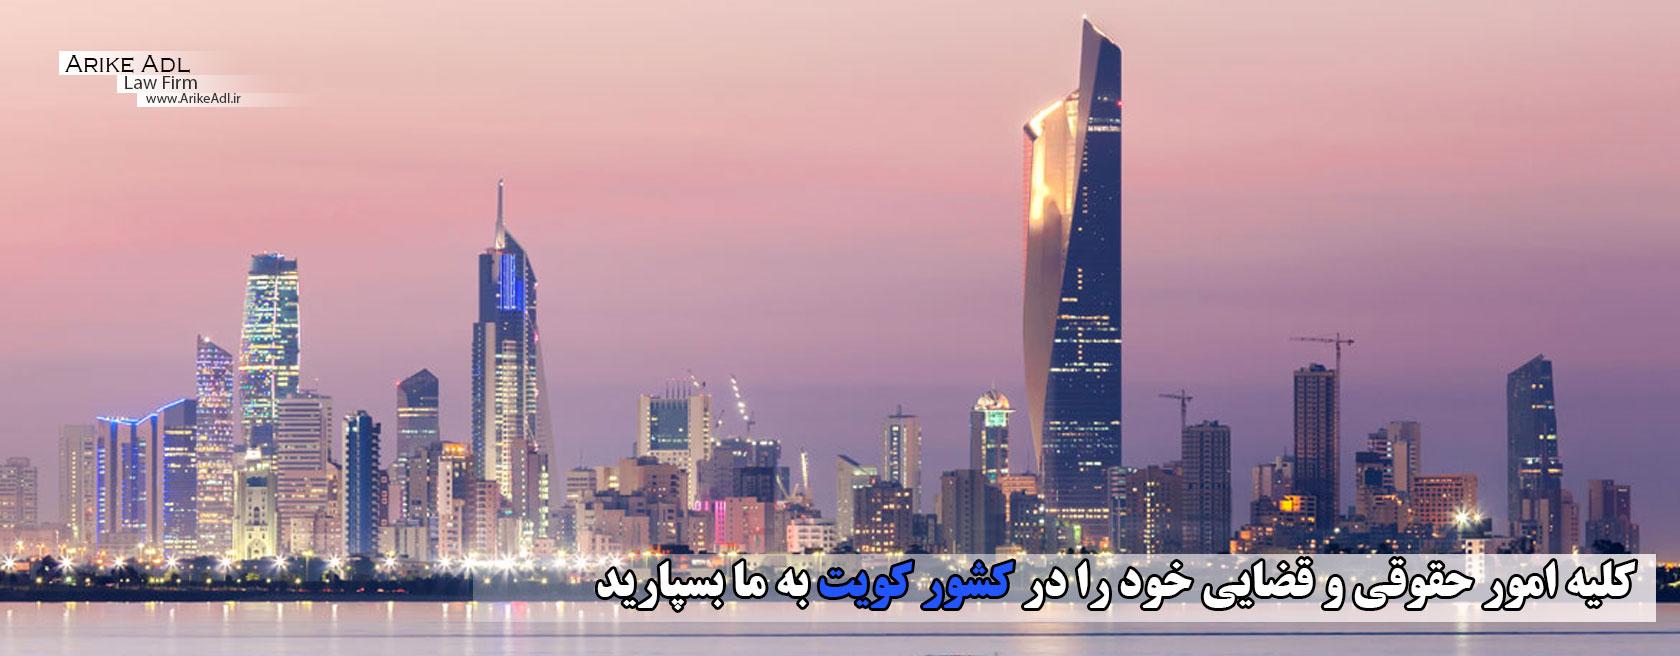 وکیل ایرانی در کویت ، وکیل کویت